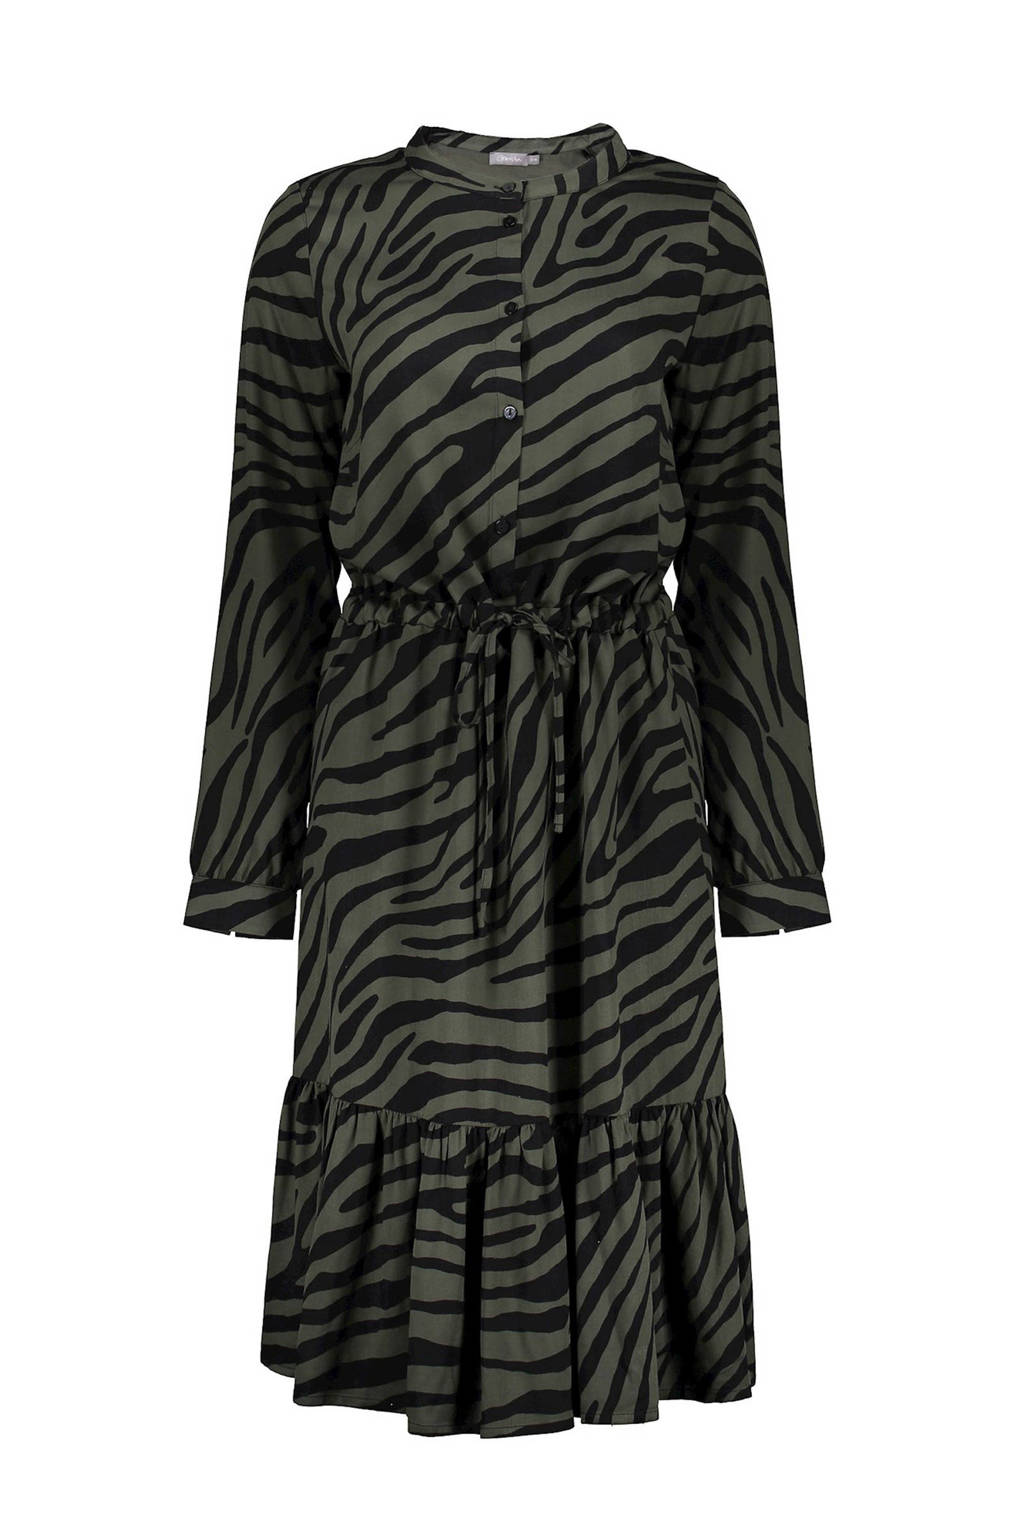 Geisha blousejurk met zebraprint en volant donkergroen/zwart, Donkergroen/zwart